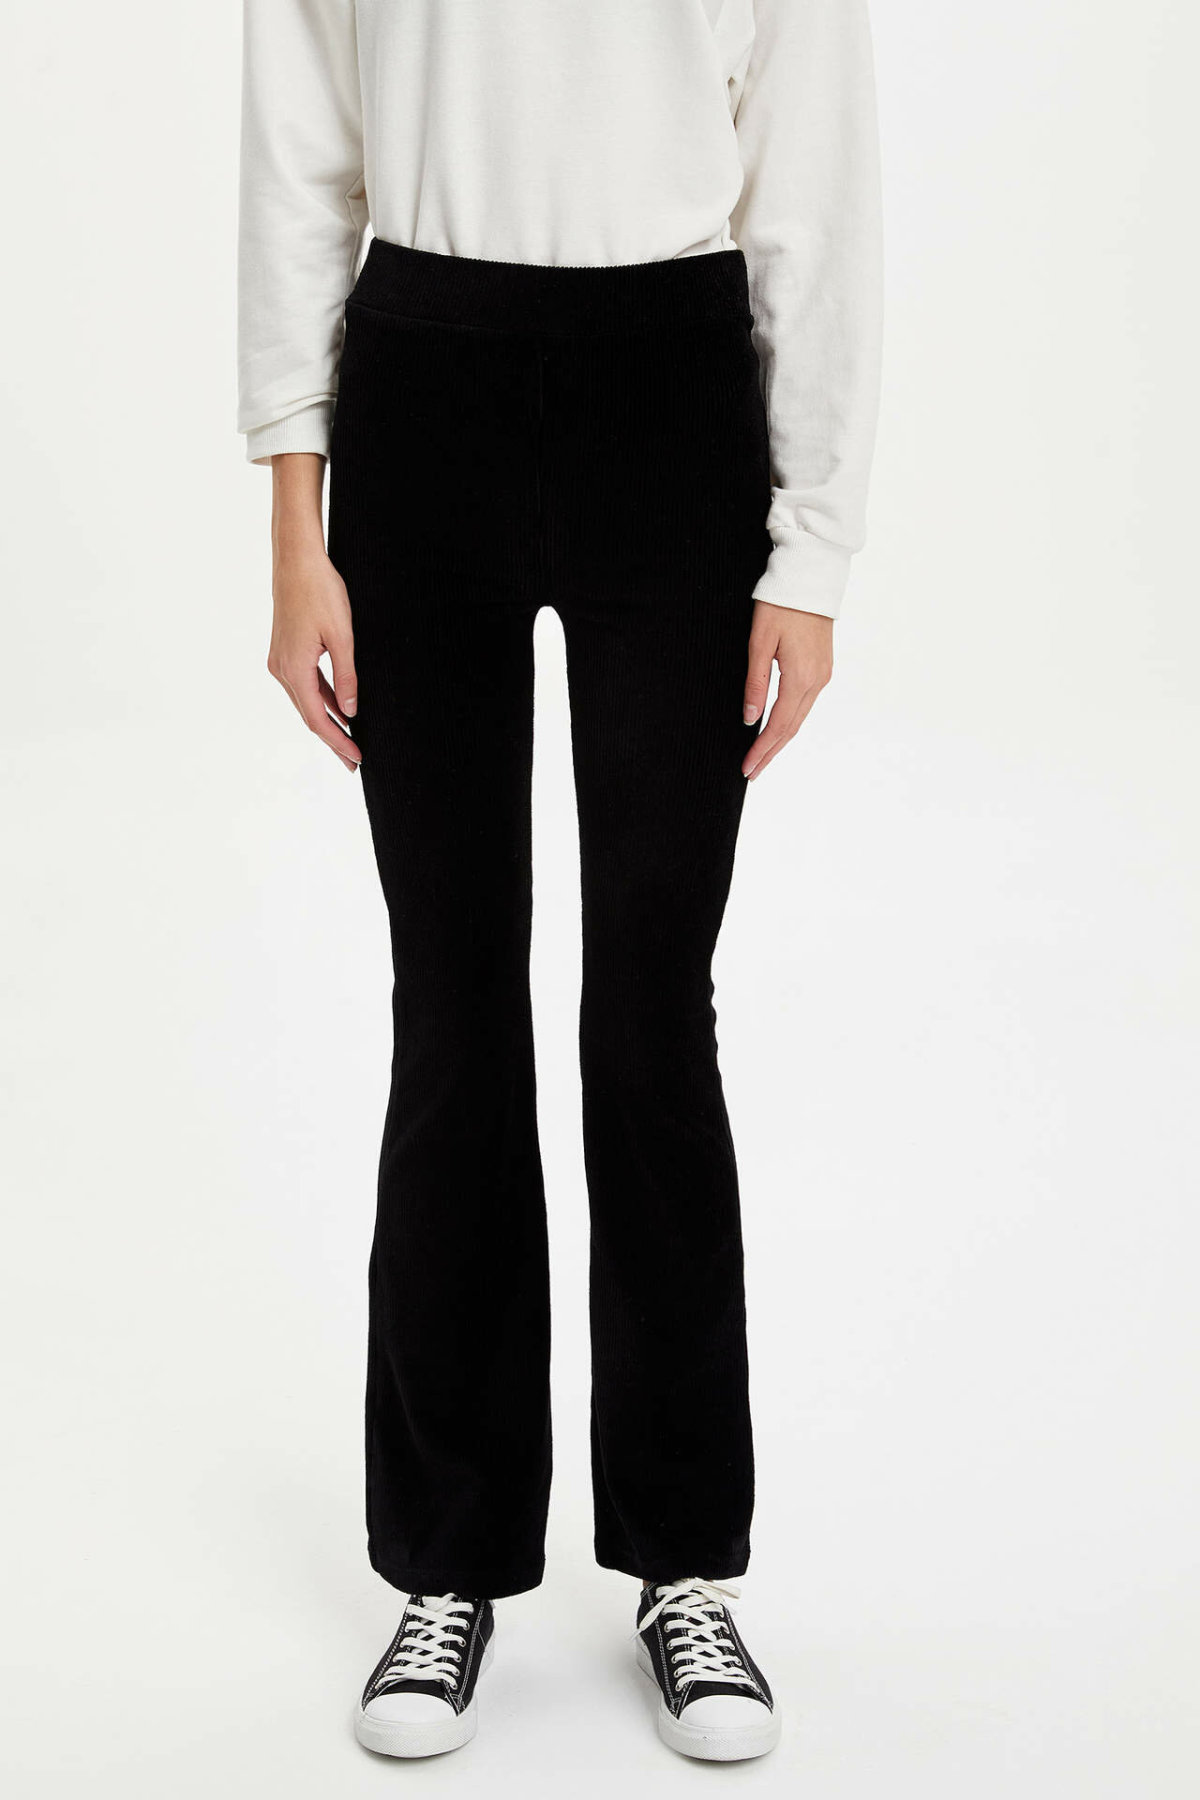 DeFacto Fashion Pants Women Mid Elastic Waist Flare Trousers Lady Casual Solid Color Pants Comfort Female Autumn - M6602AZ19WN